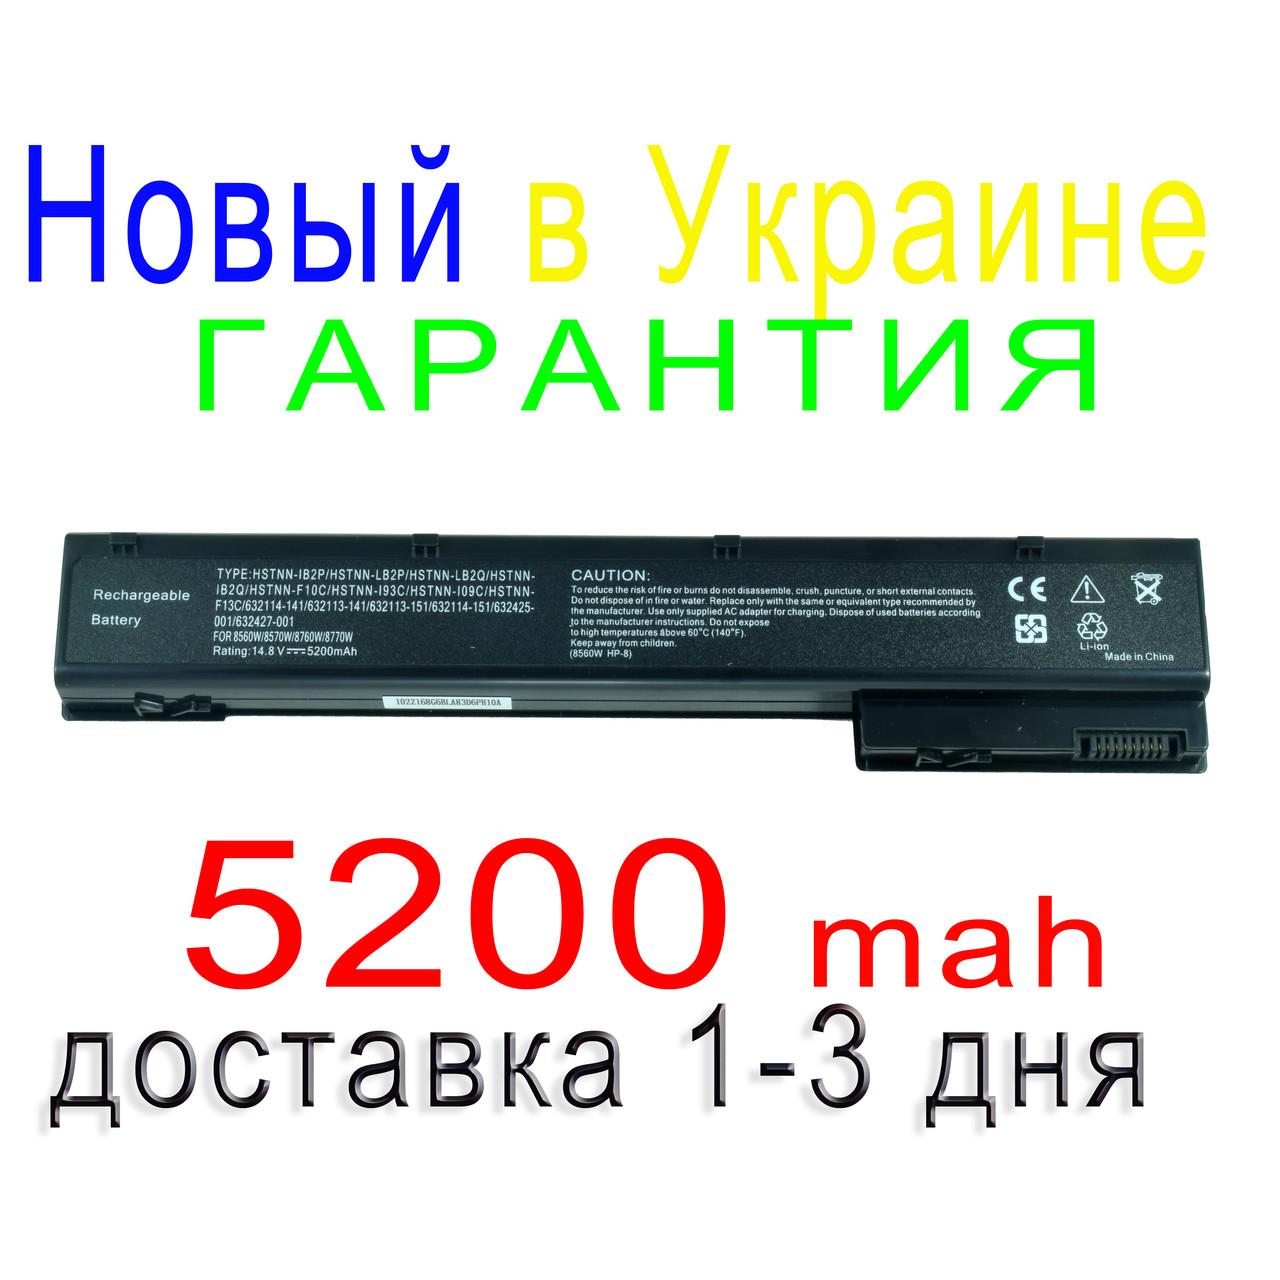 Аккумулятор батарея HP EliteBook 8560w 8570w 8760w 8770w Mobile Workstation